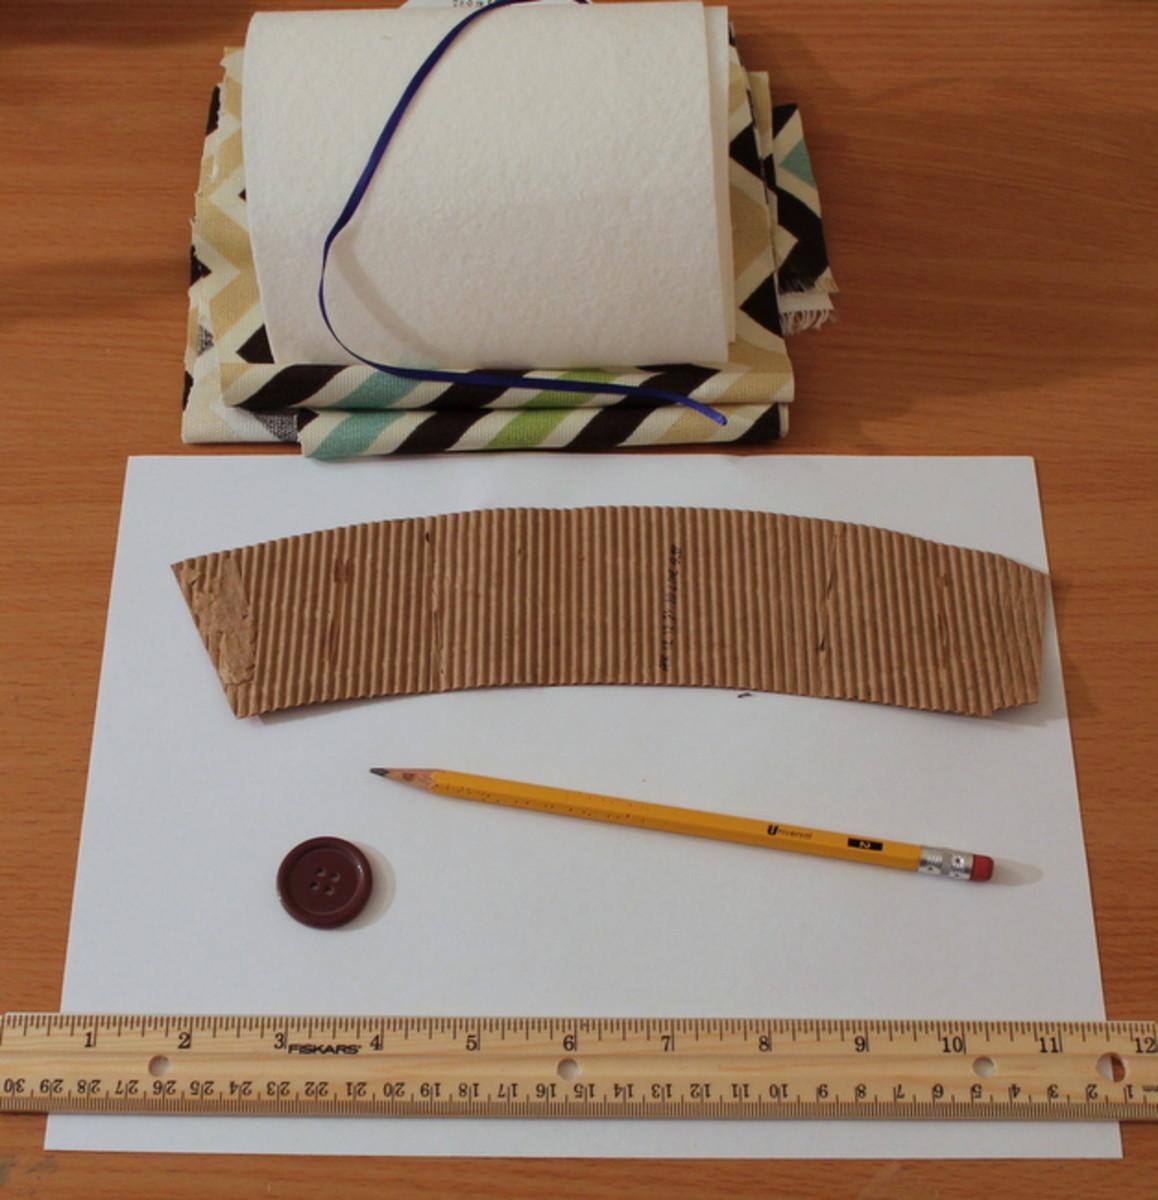 Supplies for a reusable coffee sleeve